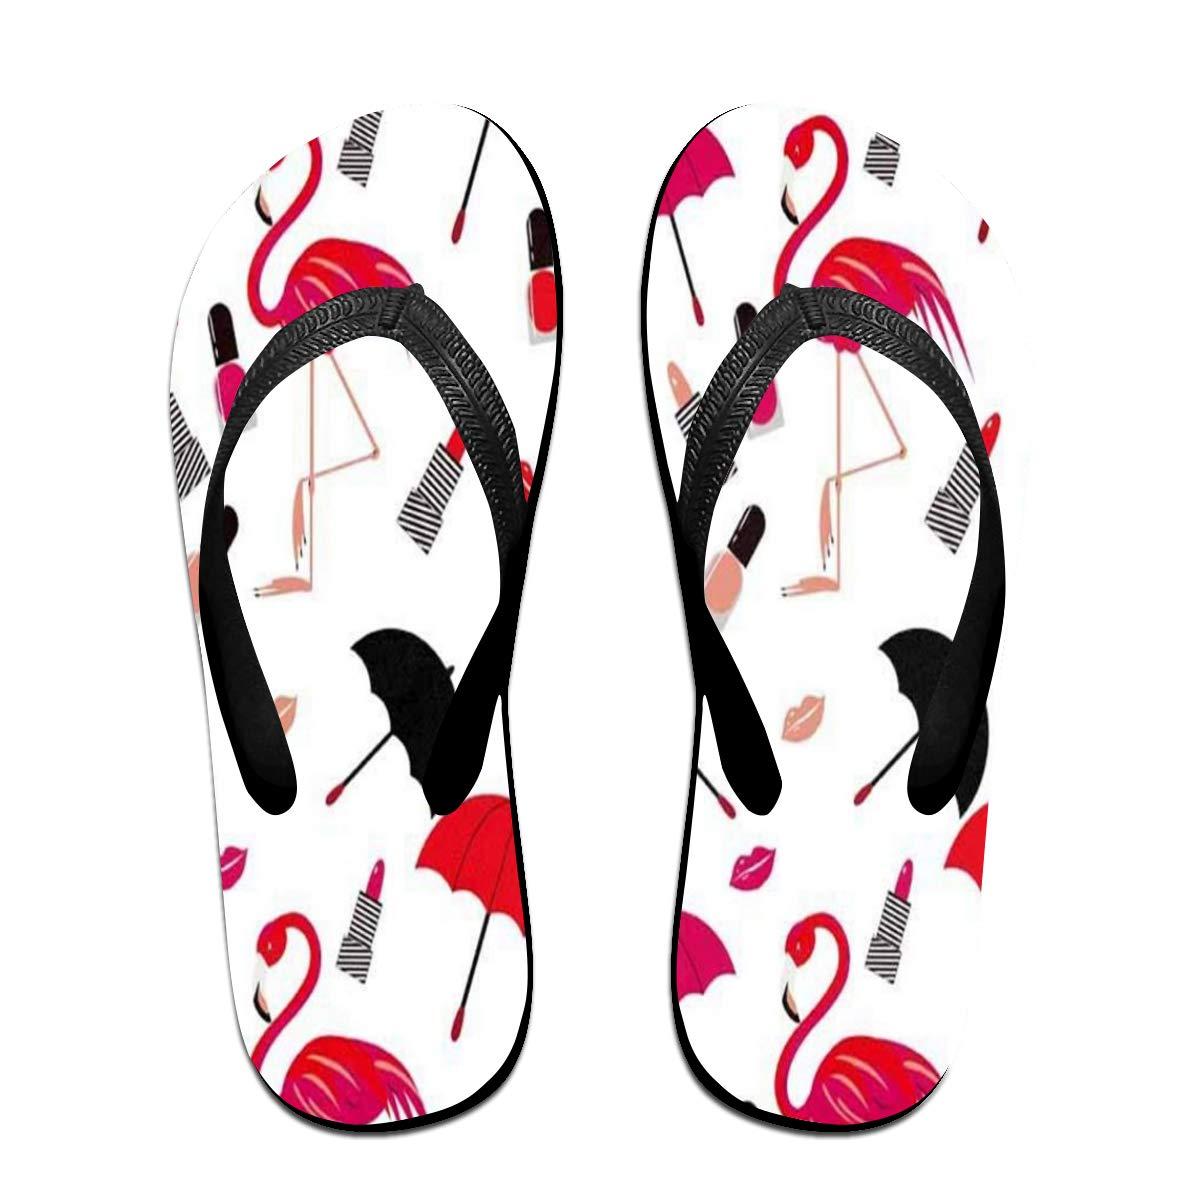 Ladninag Flip Flops Flamingo Lipstick Umbrella Red Womens Indoor Slippers Thong Sandals for Mens